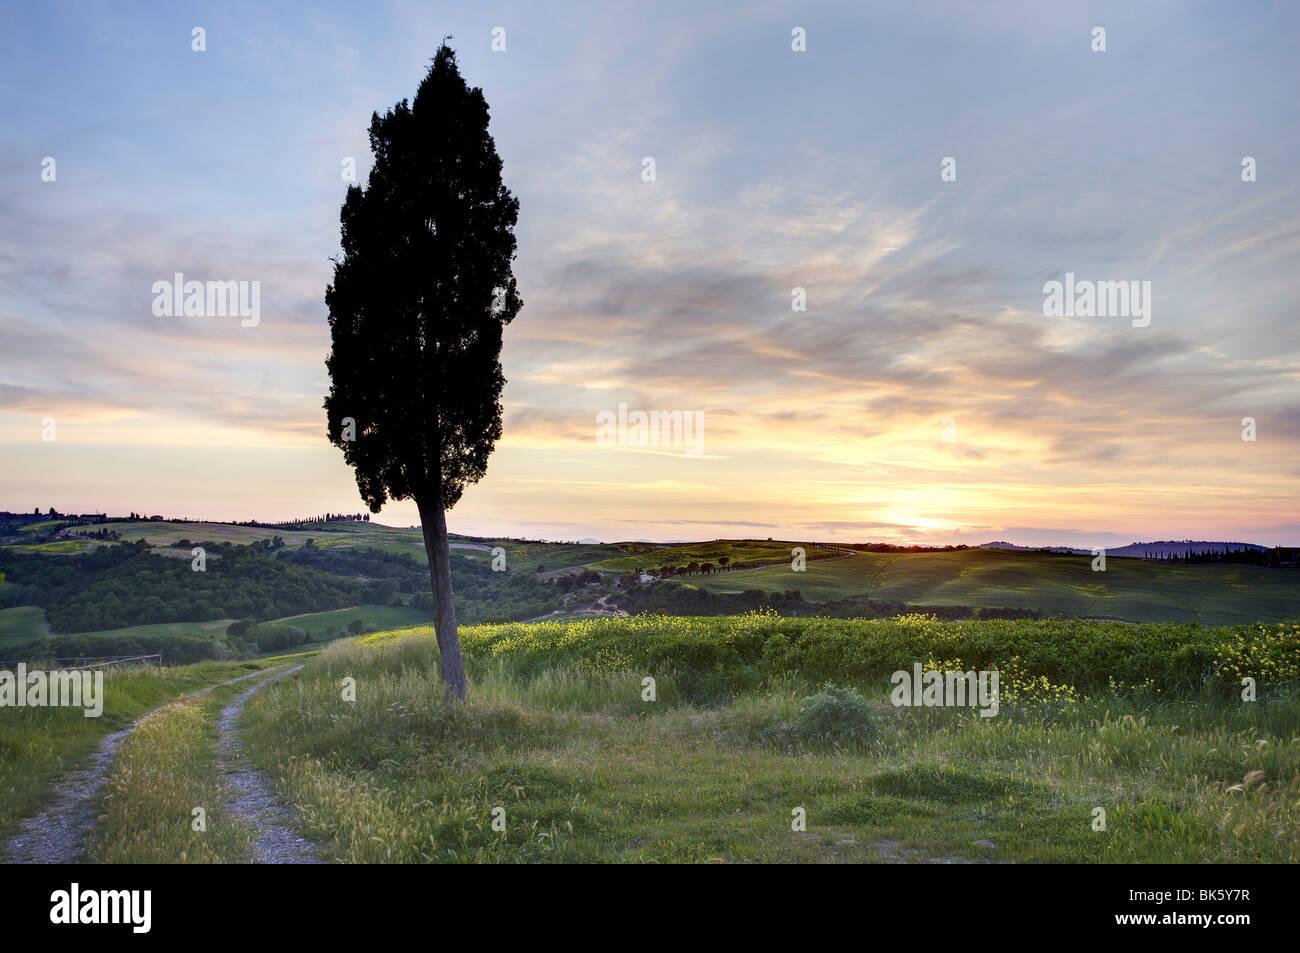 Lone cypress tree at sunset, near Pienza, Tuscany, Italy, Europe - Stock Image